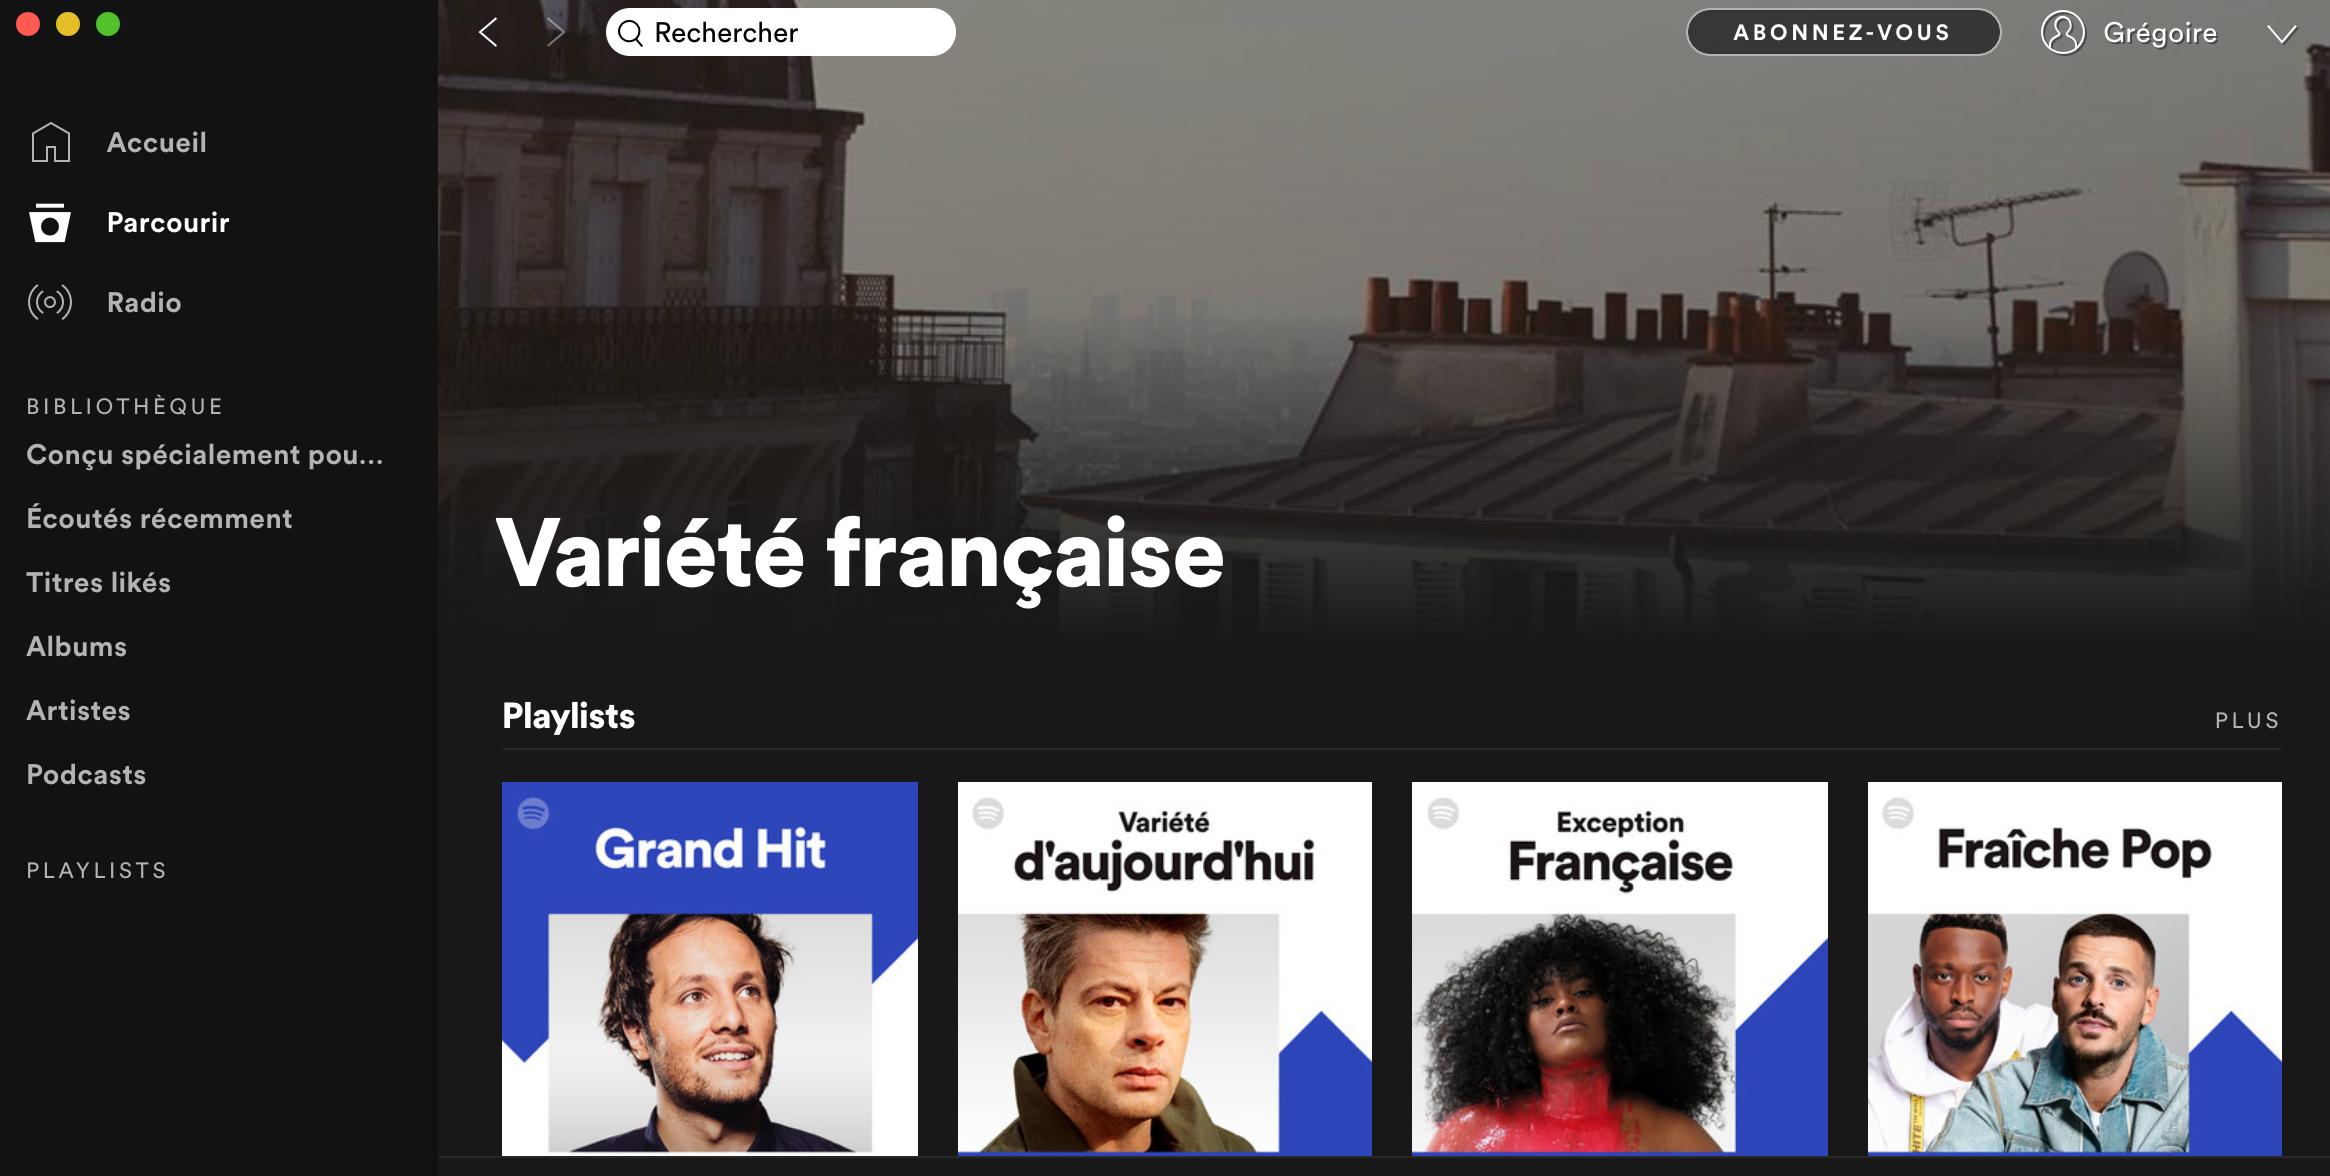 Catégorie Variété française Spotify